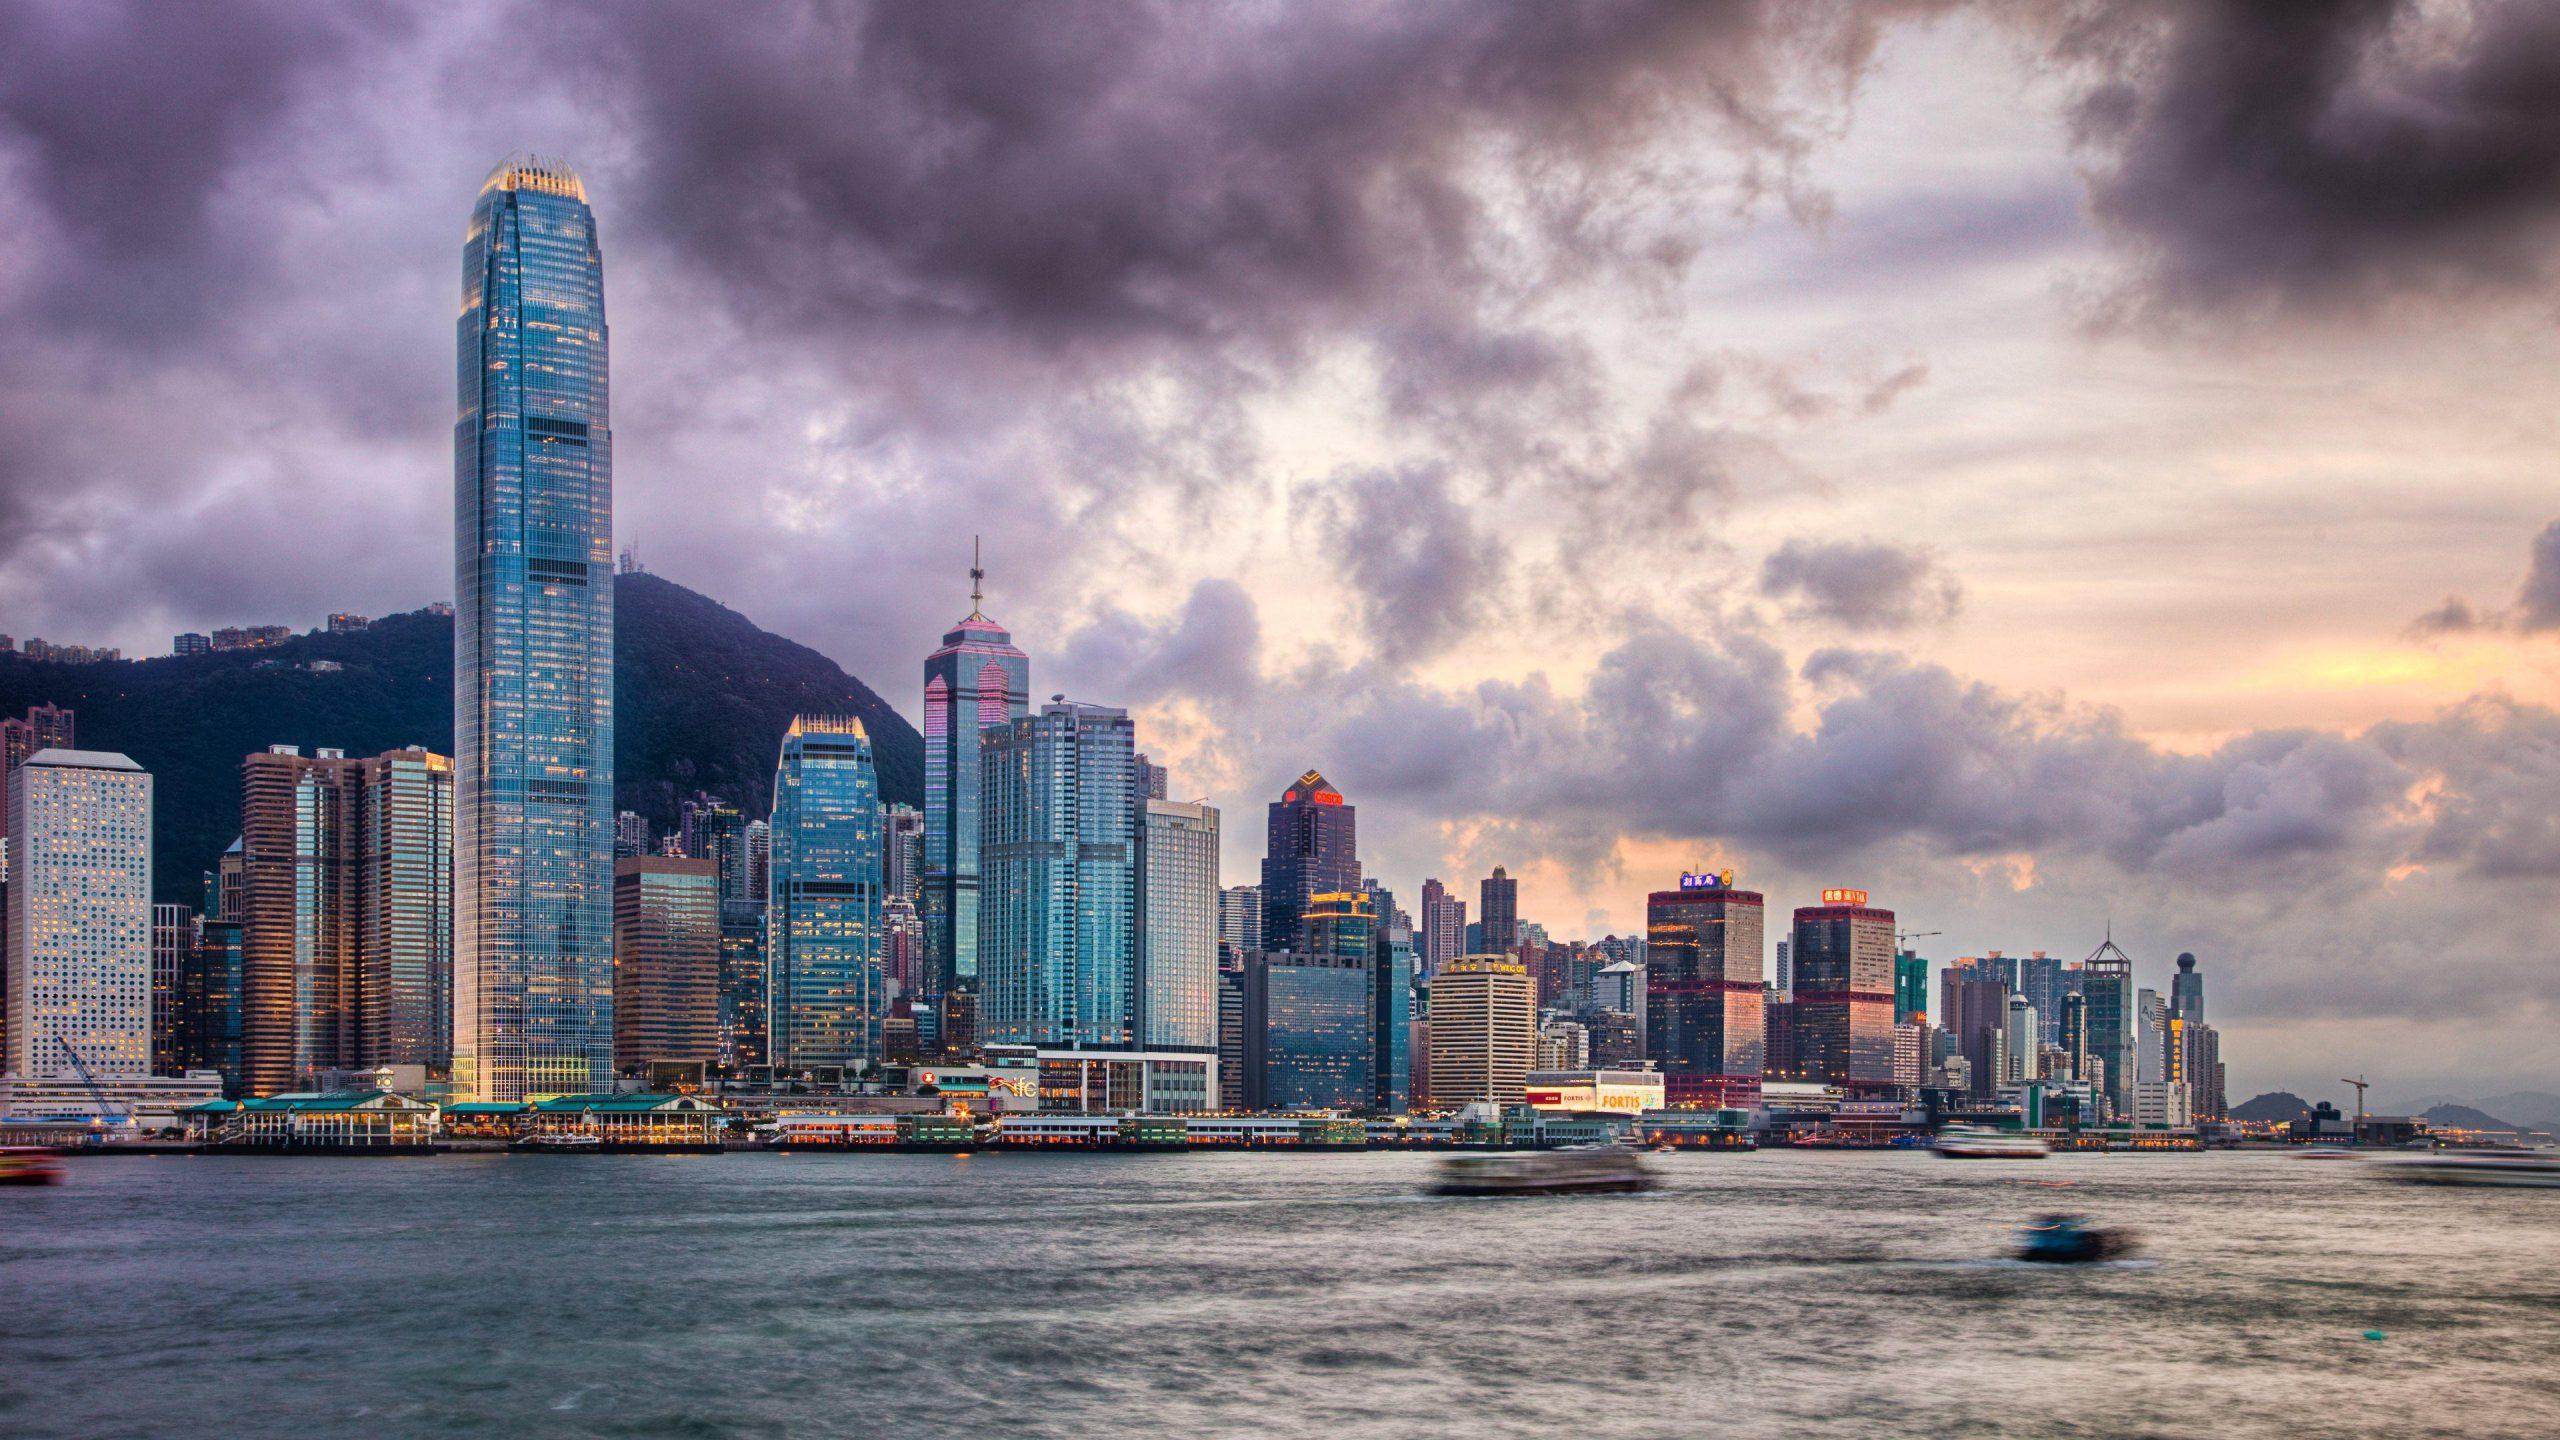 Hong Kong Picture